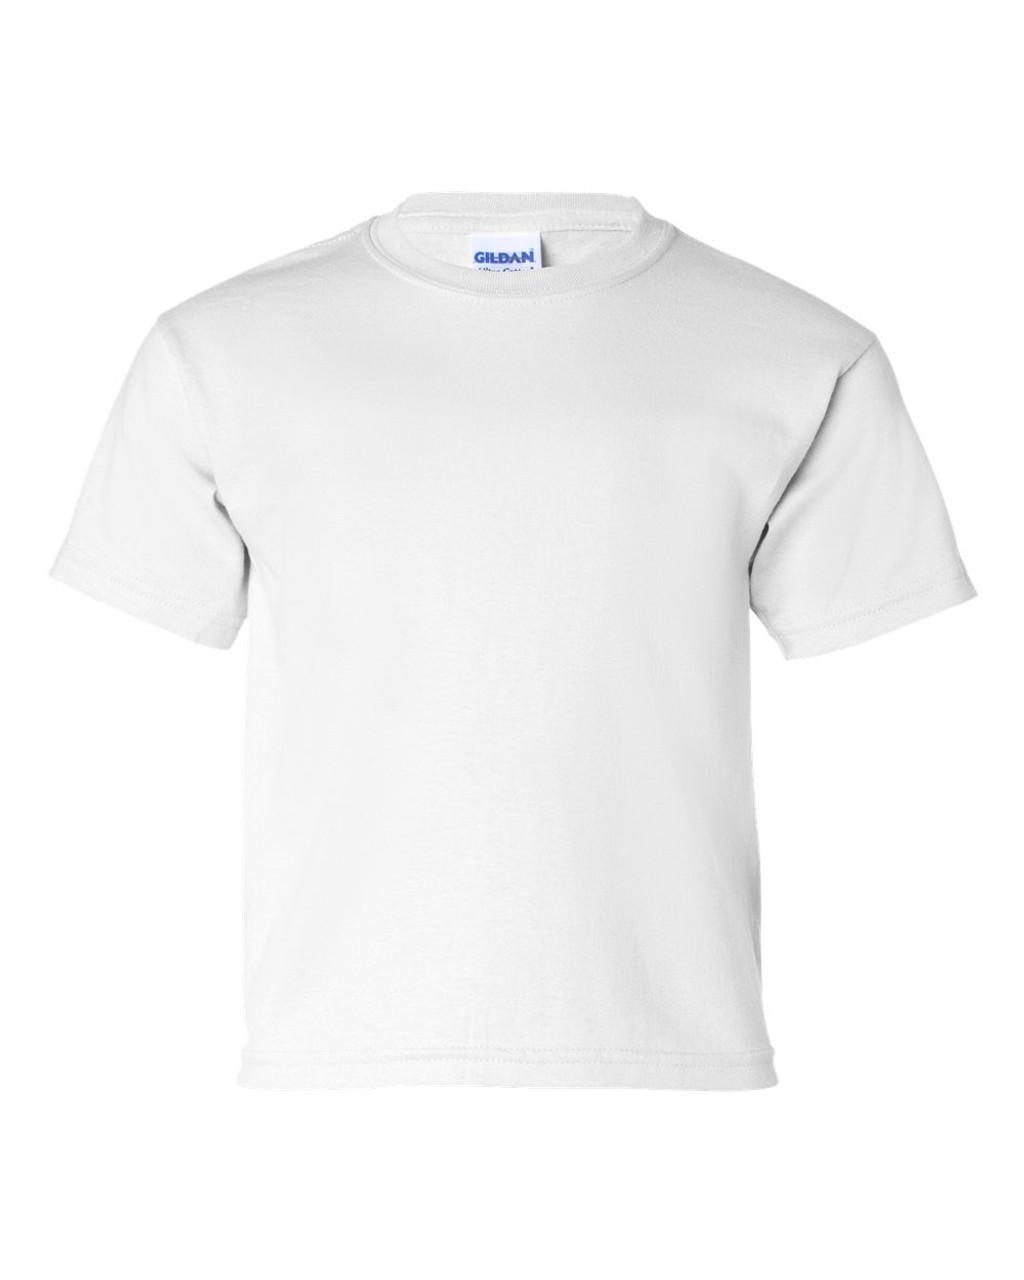 2000B Gildan Ultra Cotton Youth T-shirt   T-shirt.ca